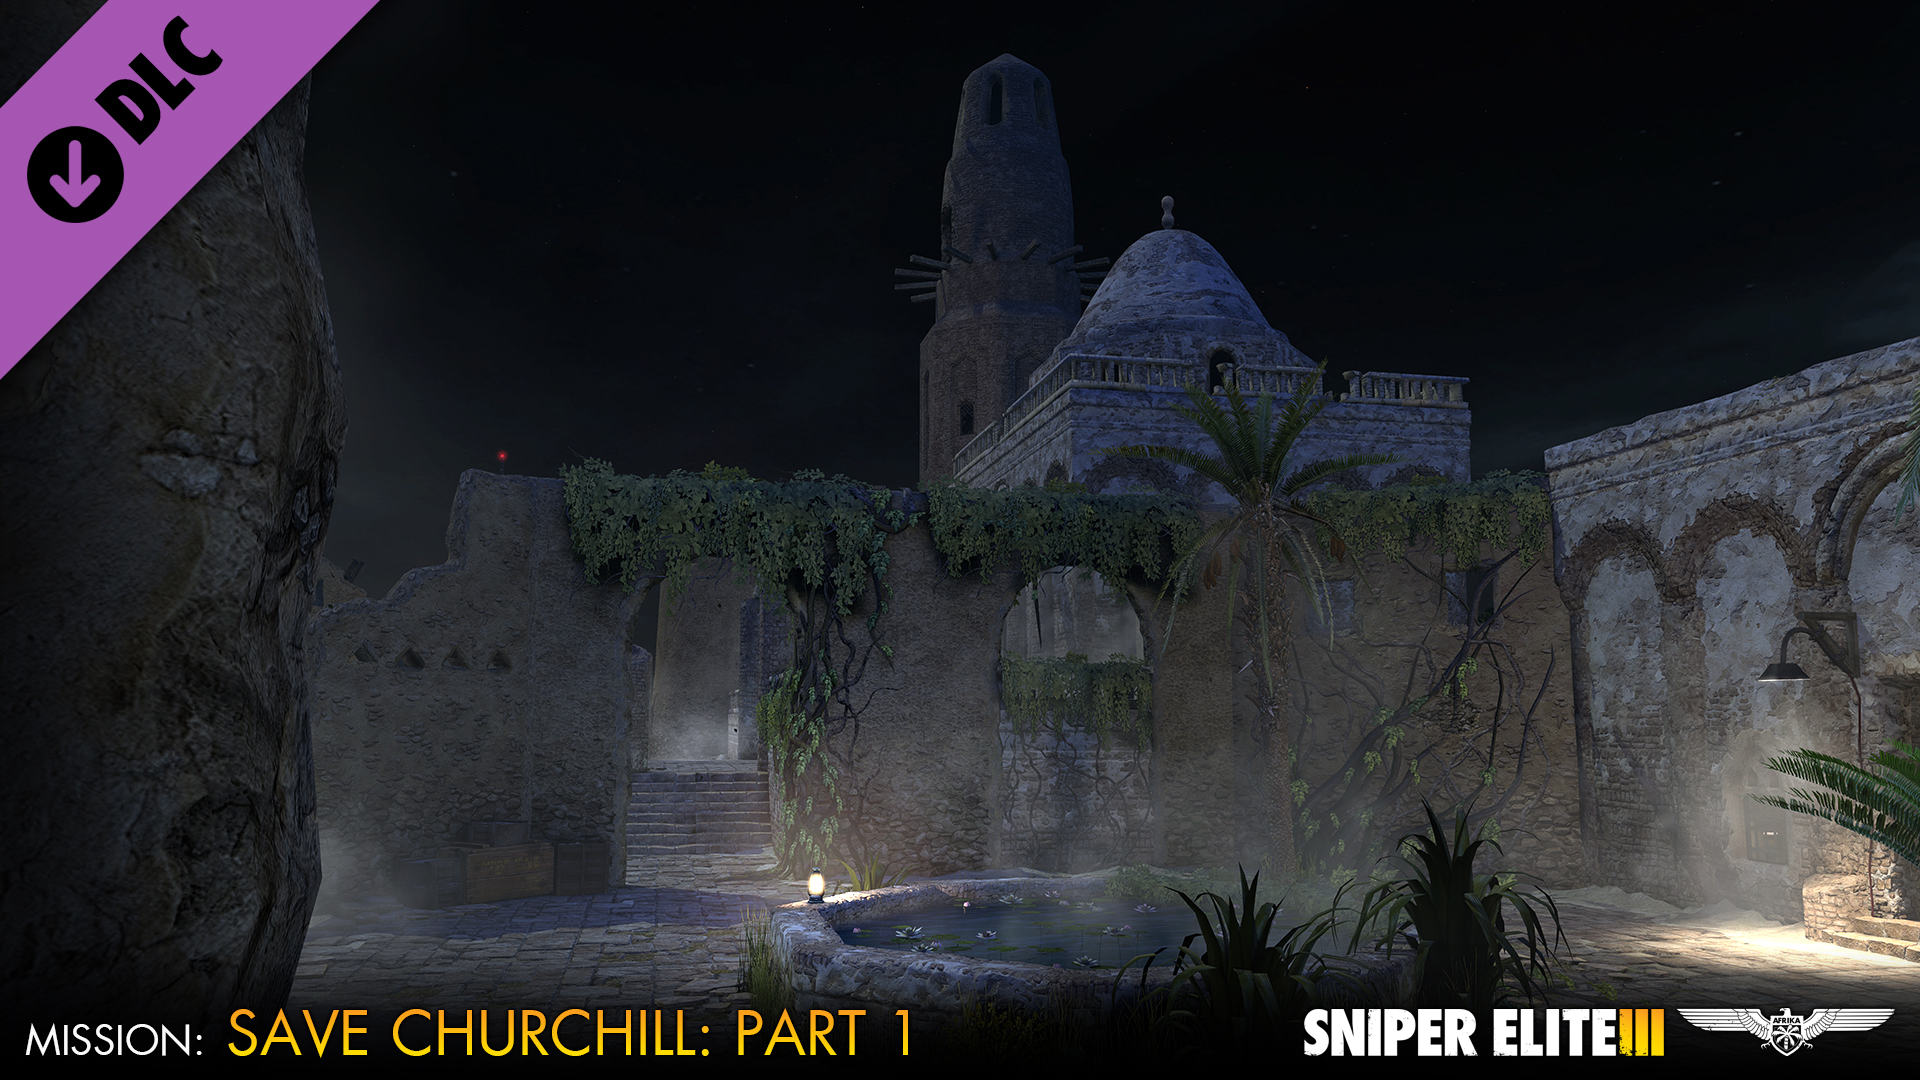 Sniper Elite 3 - Save Churchill Part 1: In Shadows screenshot